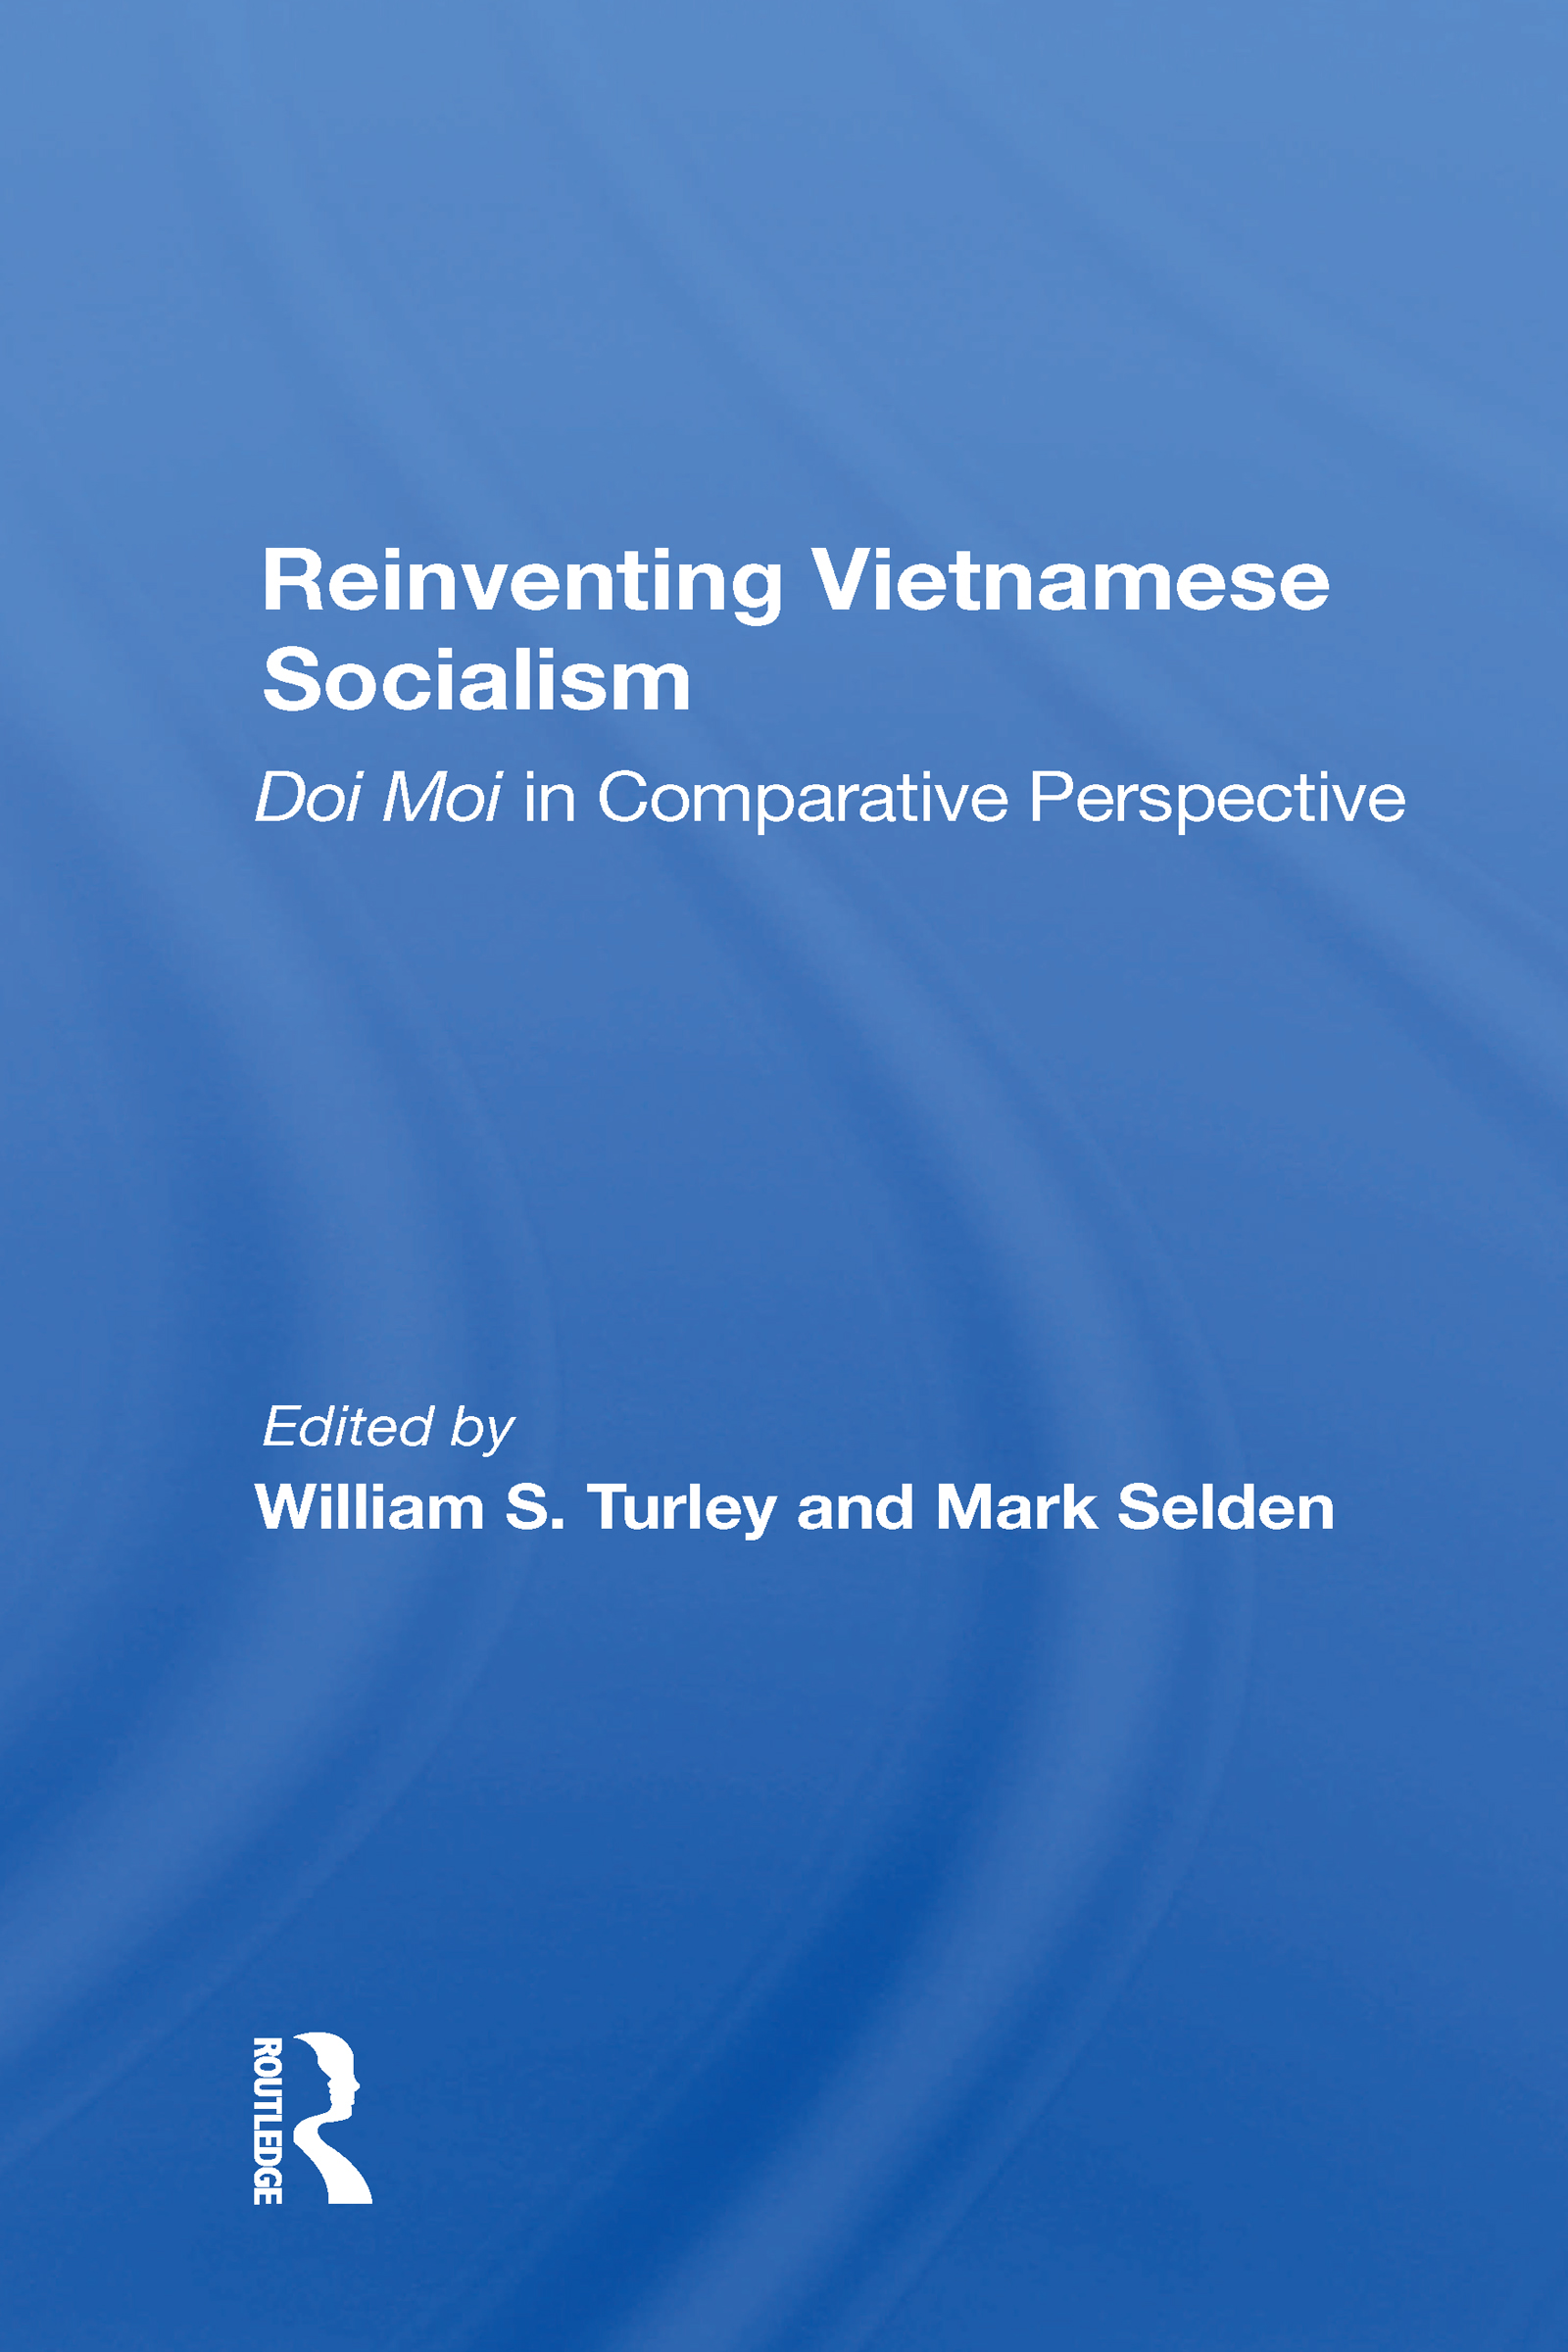 Reinventing Vietnamese Socialism